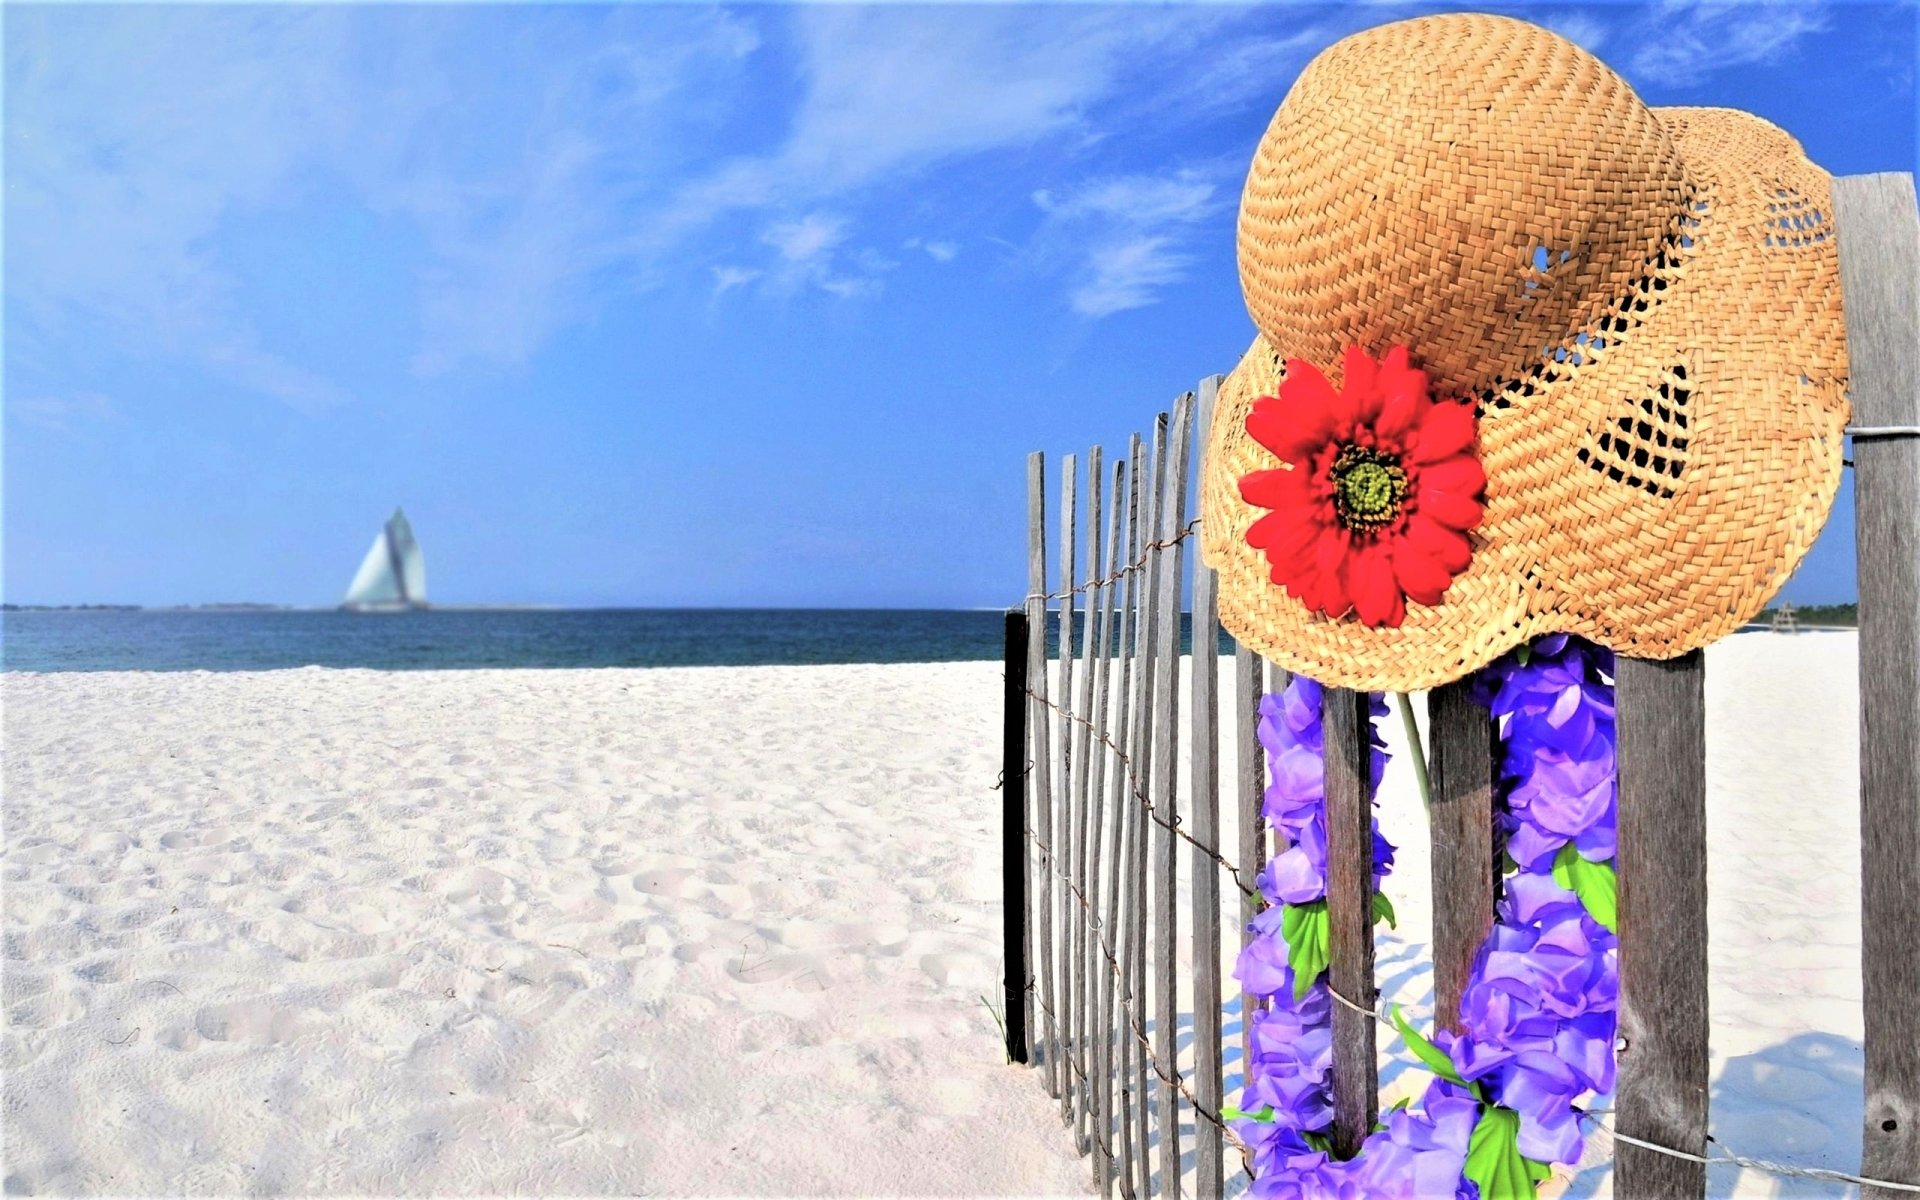 Artistic - Summer  Artistic Photography Straw Hat Flower Beach Ocean Sea Wallpaper